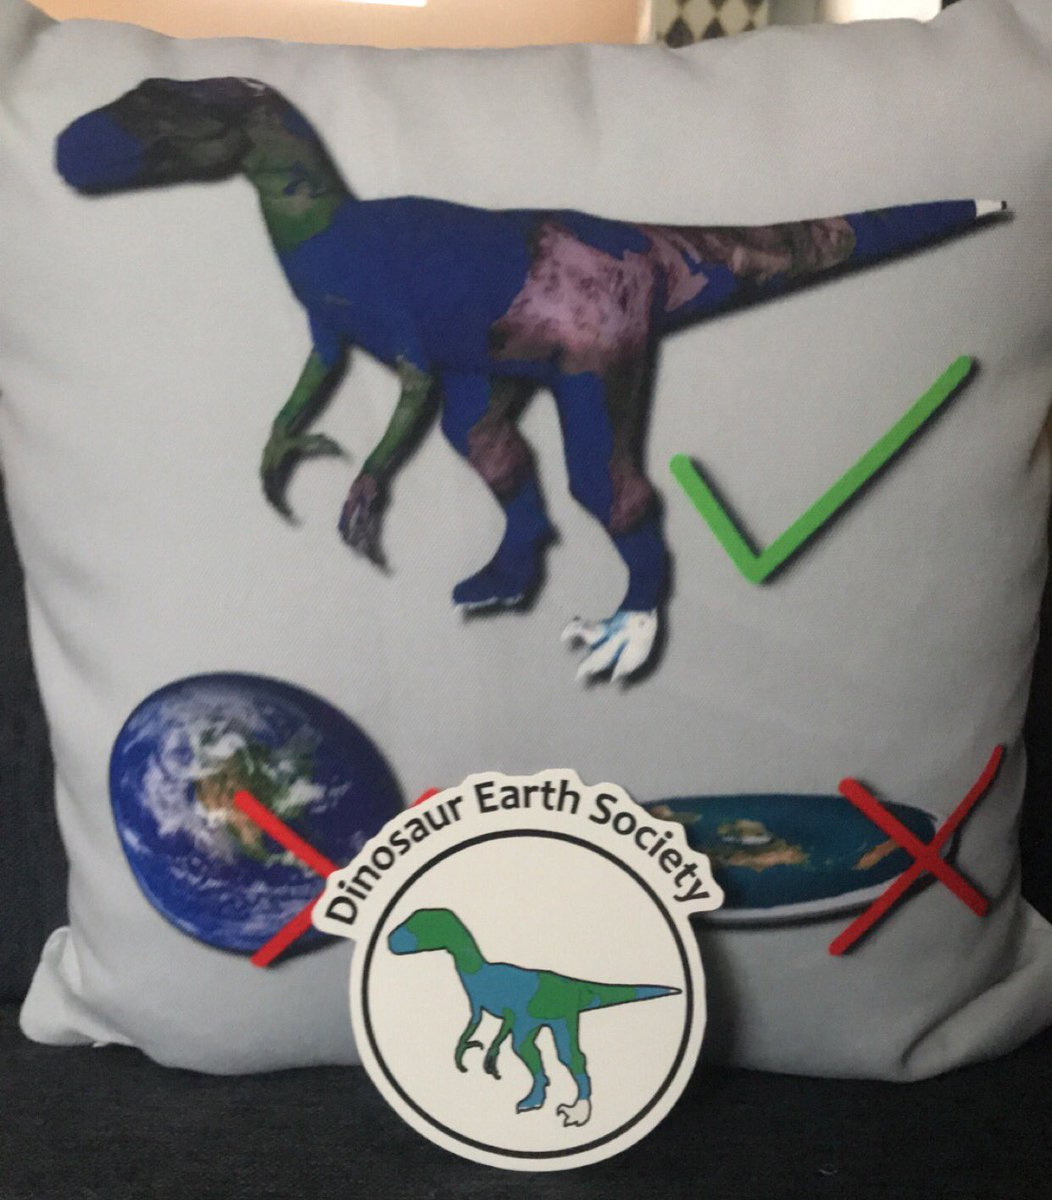 I believe in the truth @DinosaurEarth